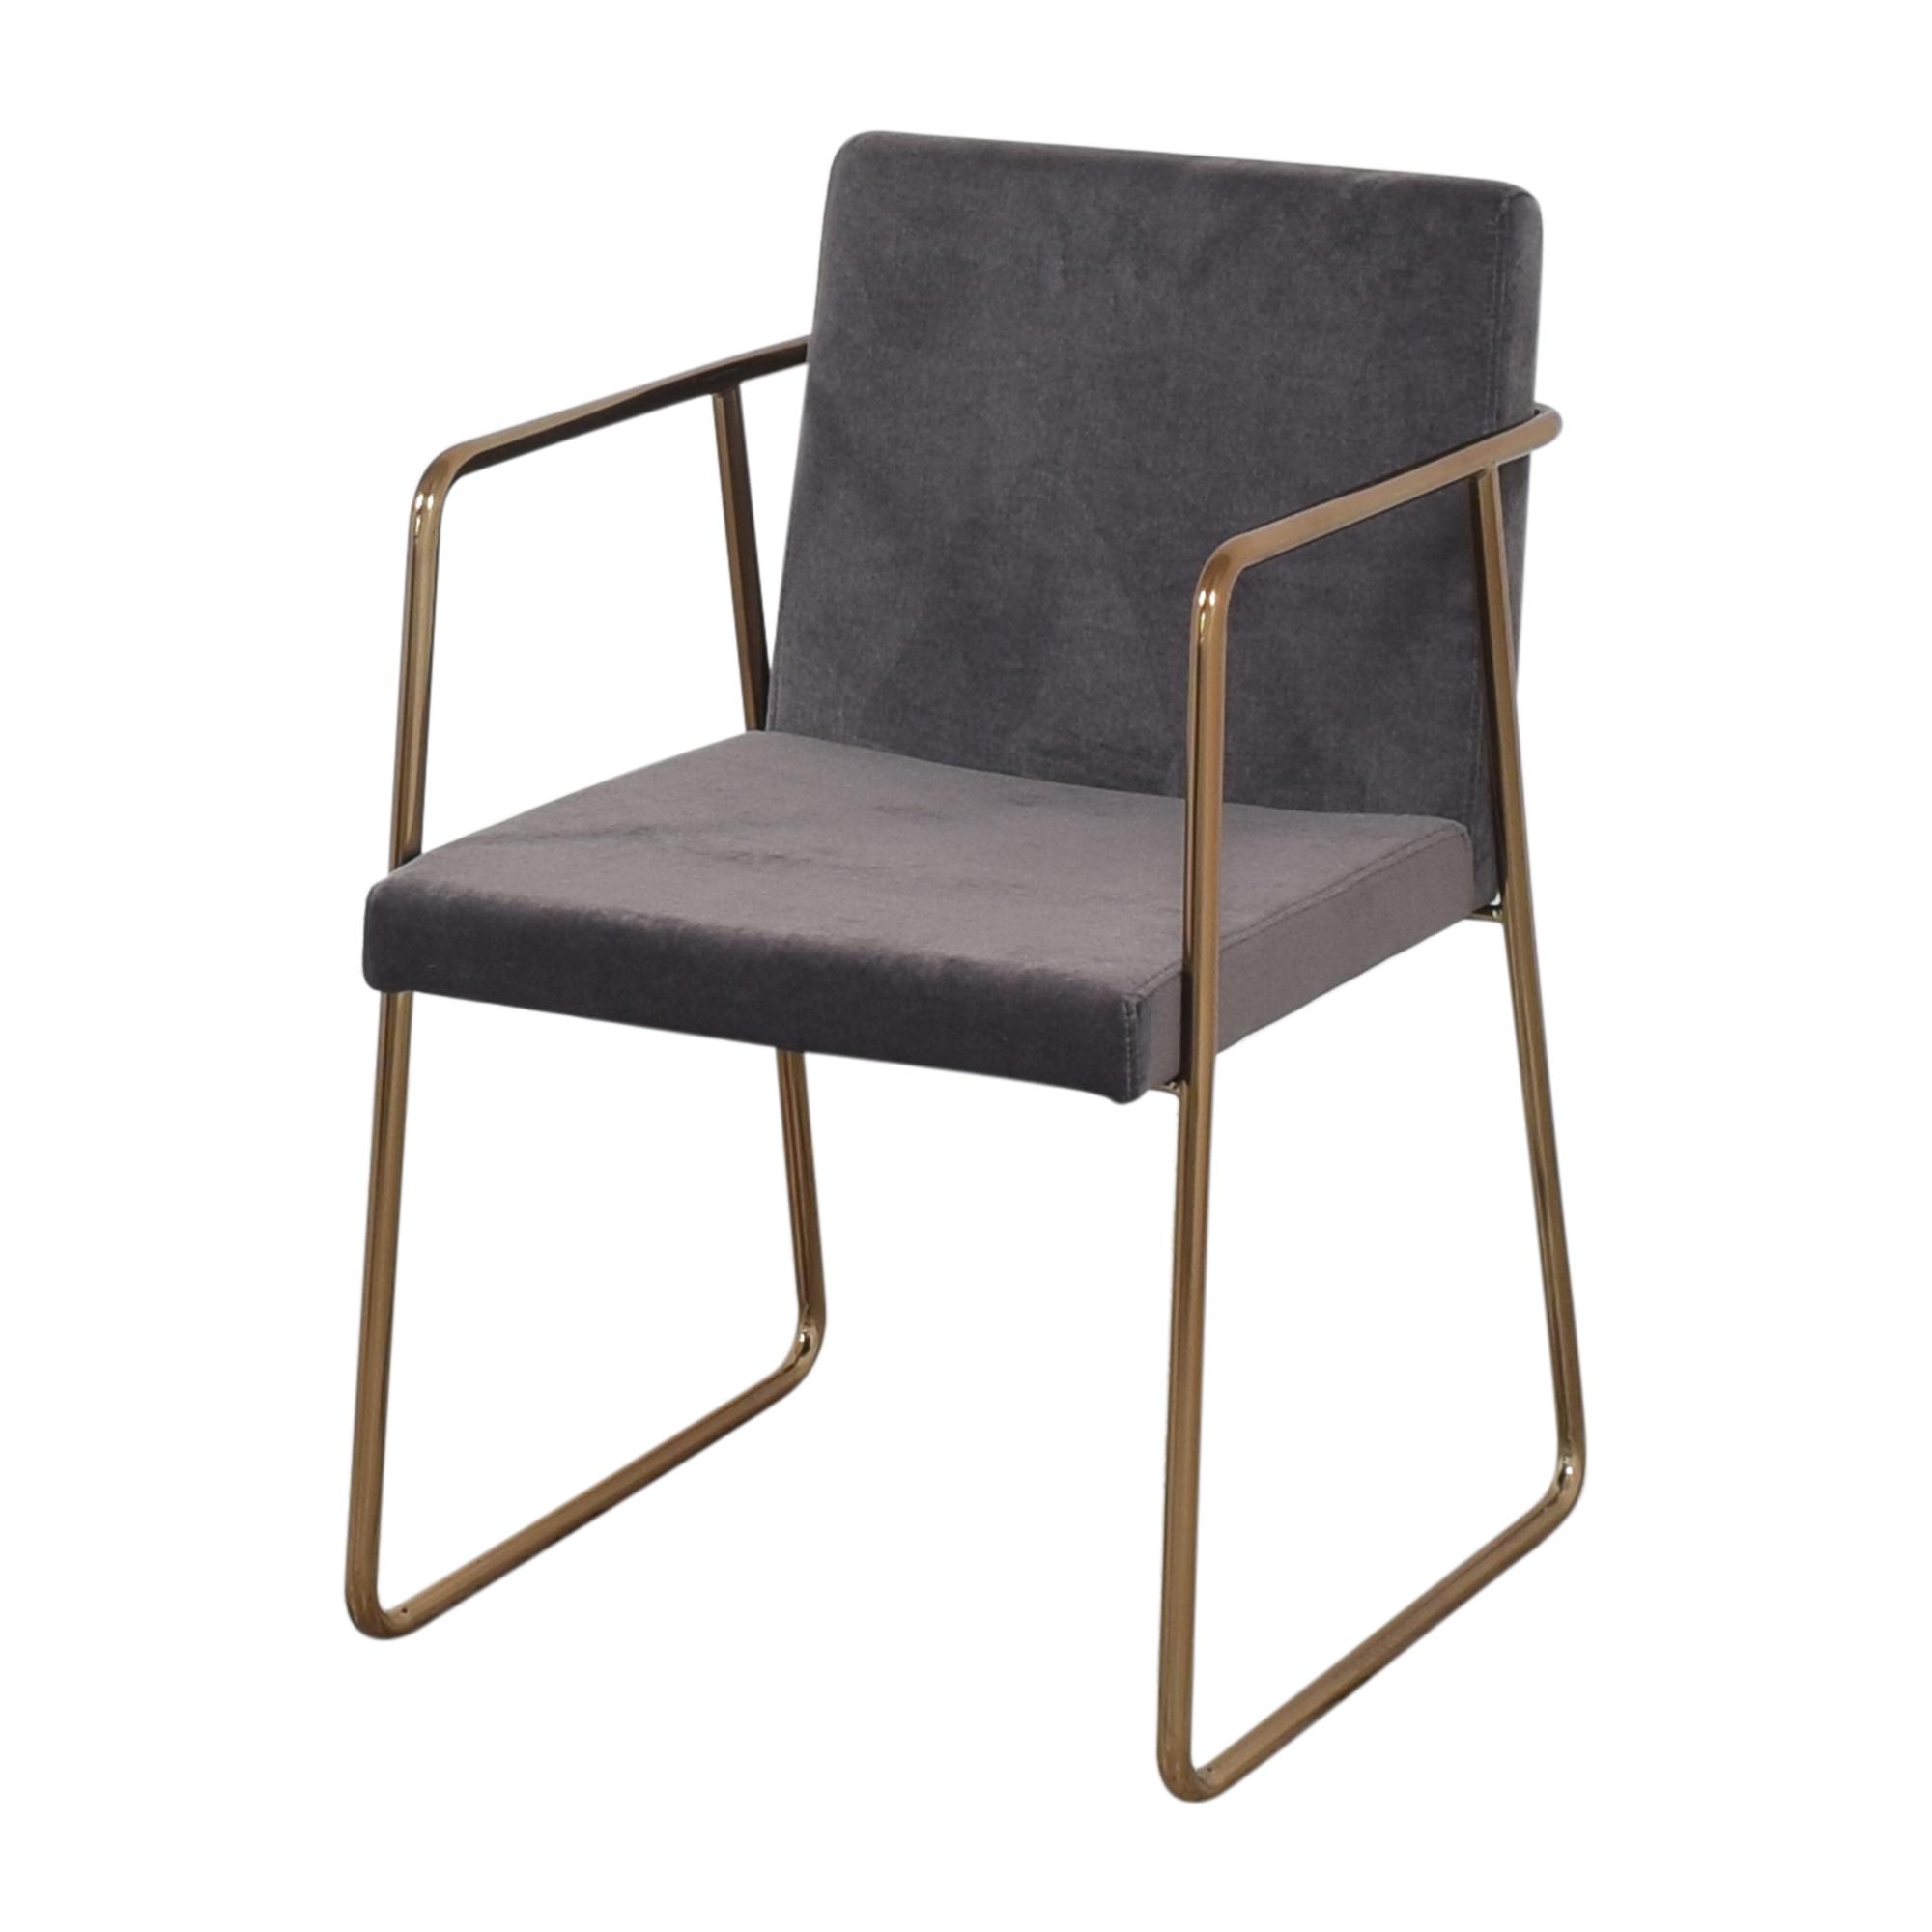 CB2 CB2 Rouka Chairs coupon